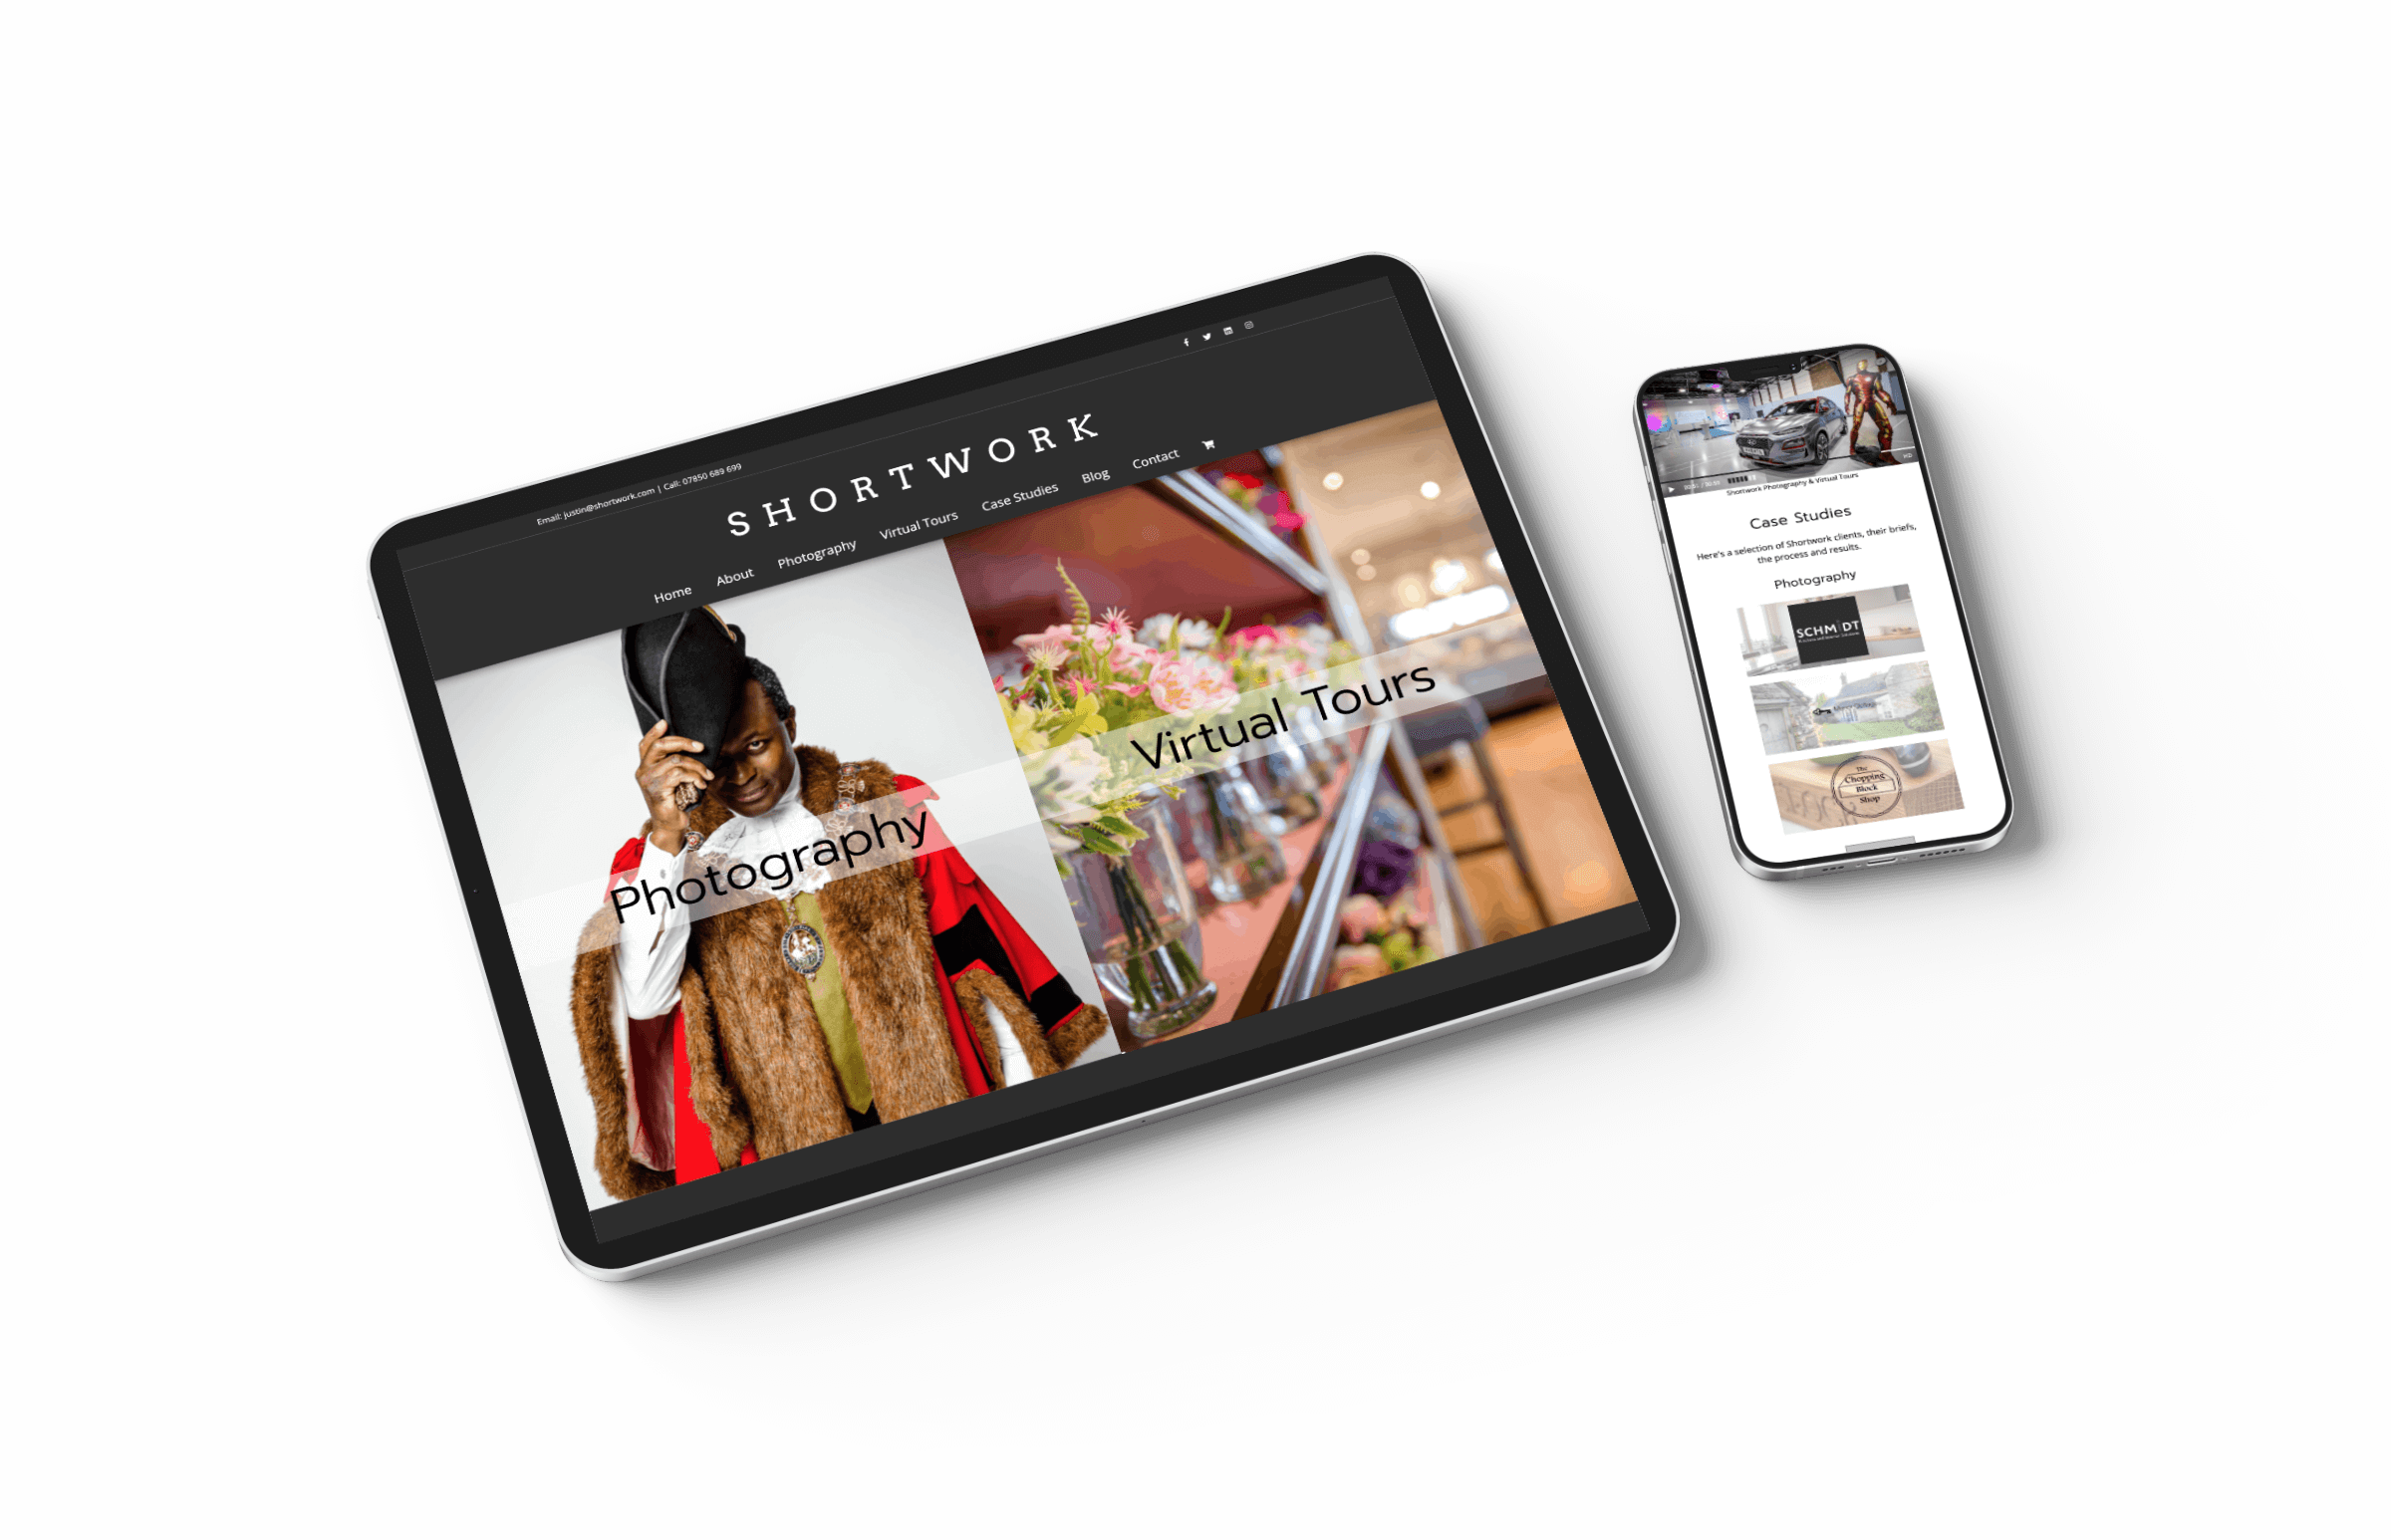 Shortwork website on iPad & iPhone